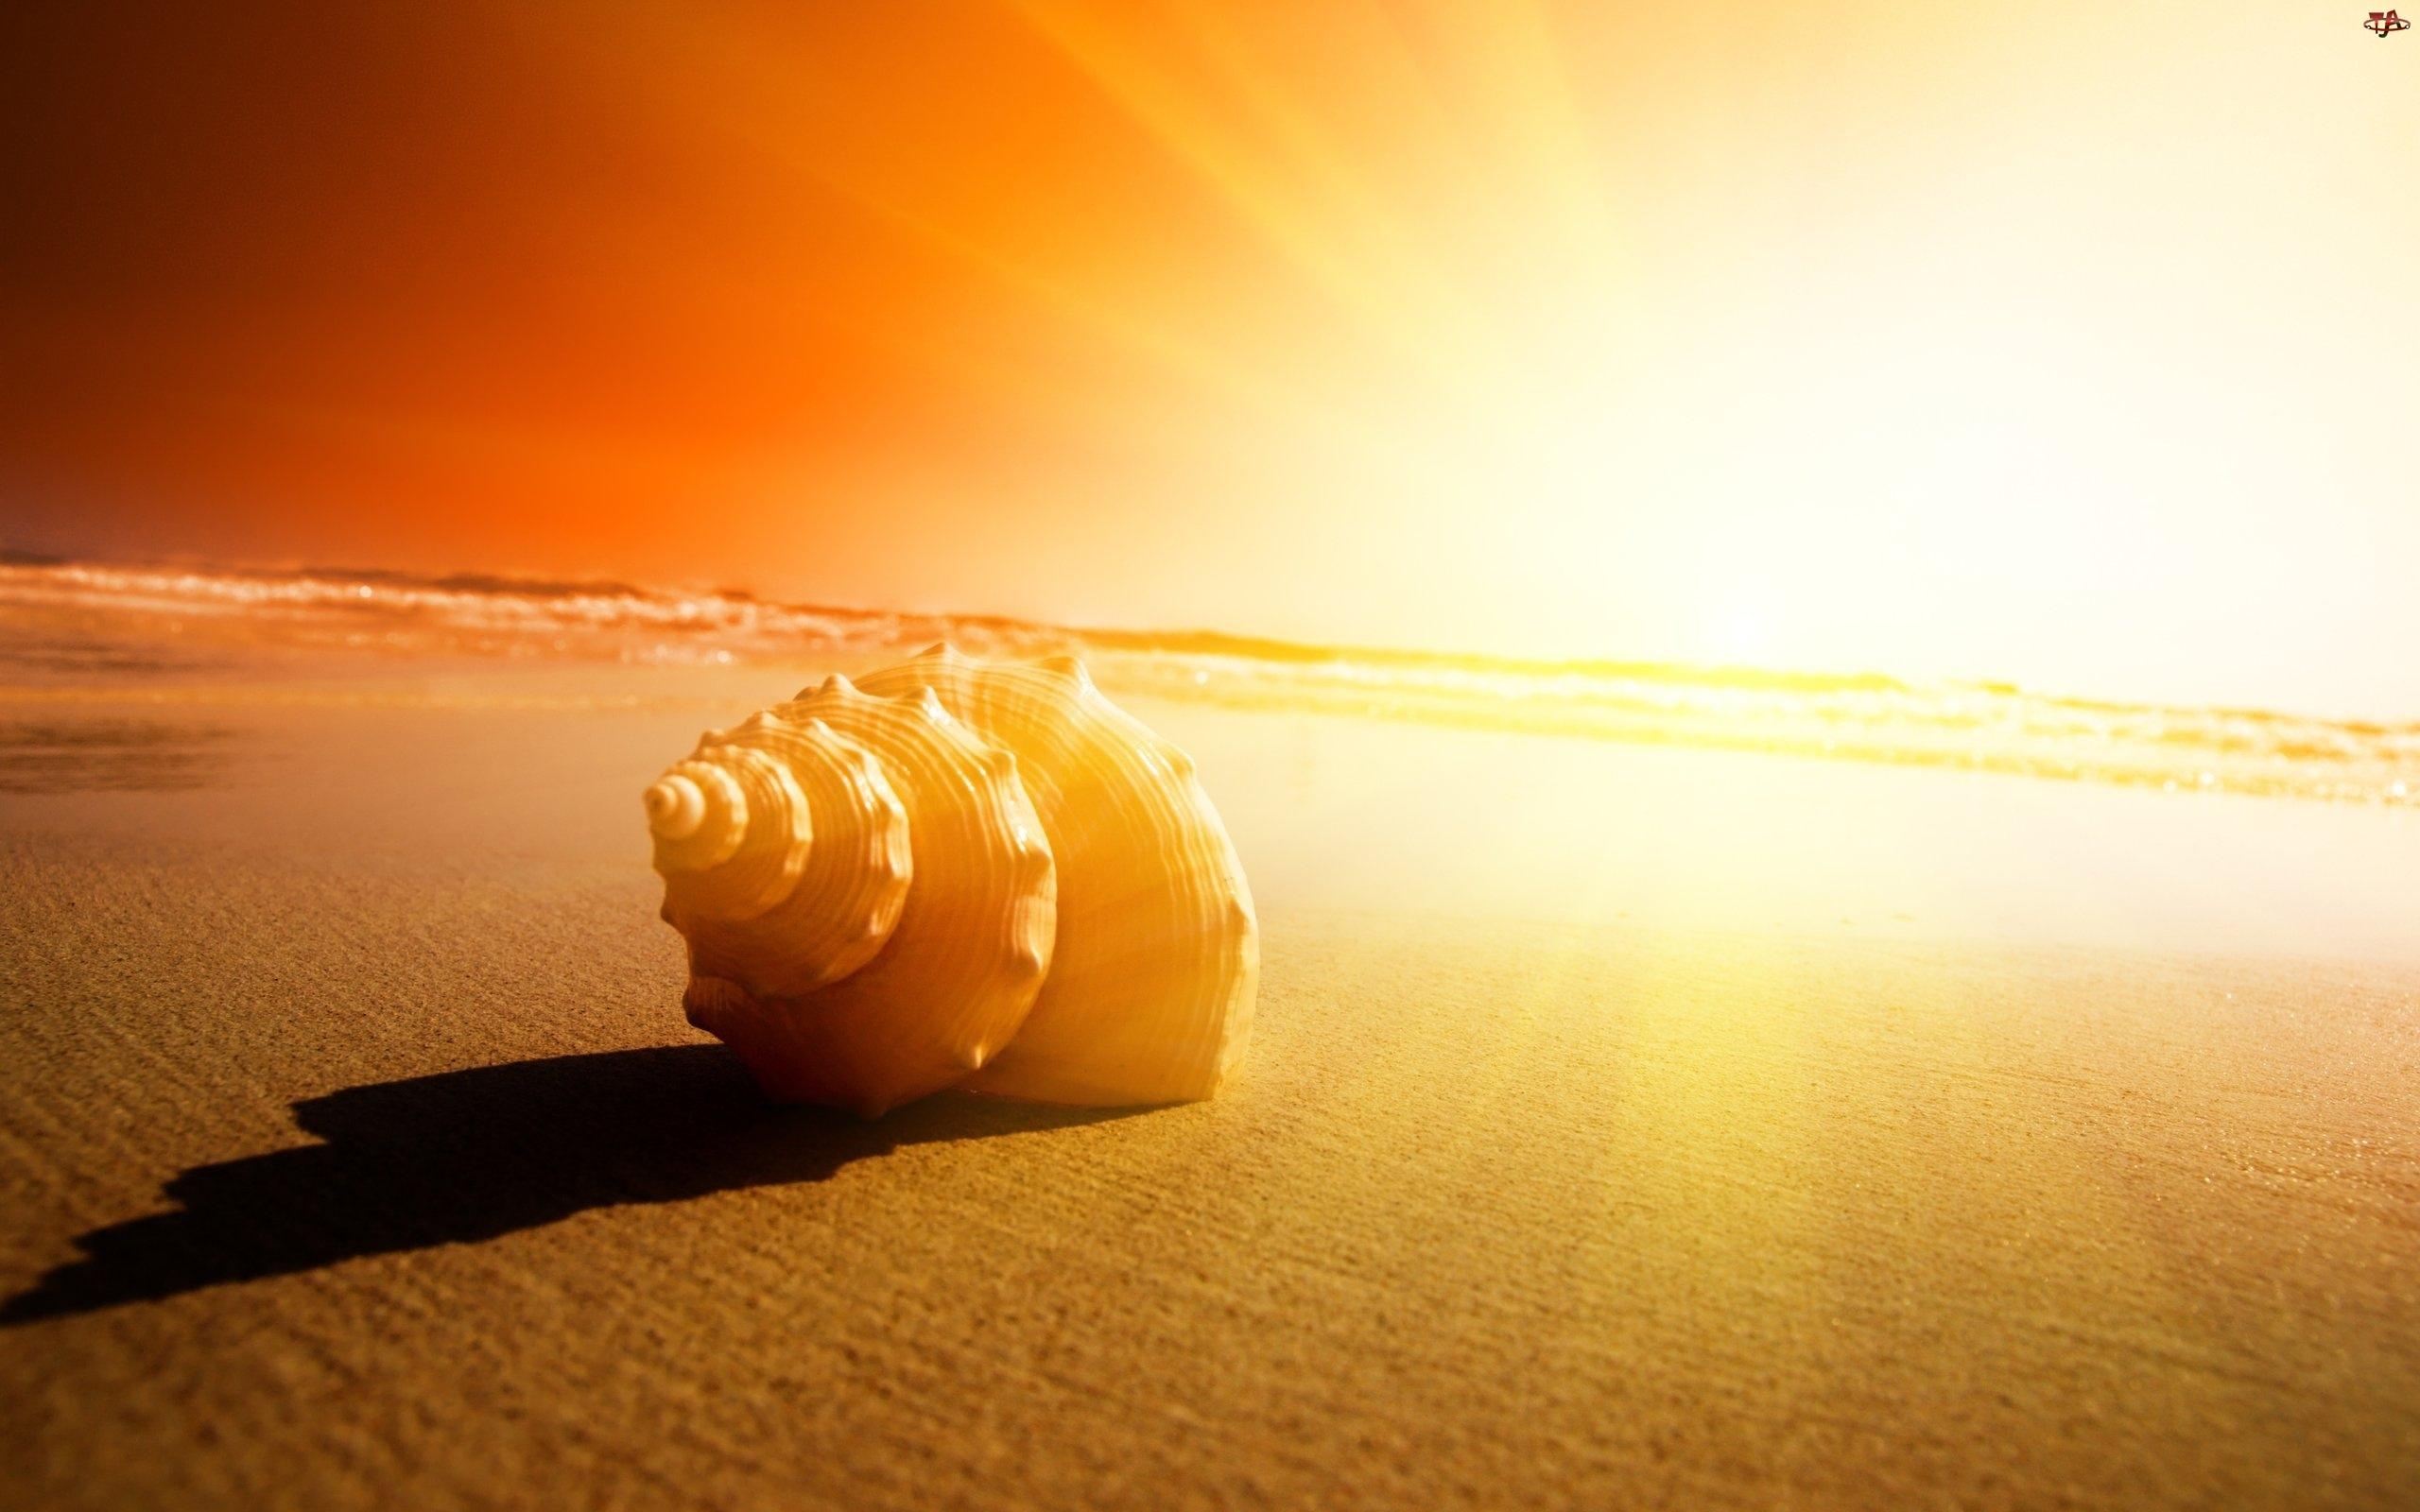 Muszla, Słońca, Plaża, Zachód